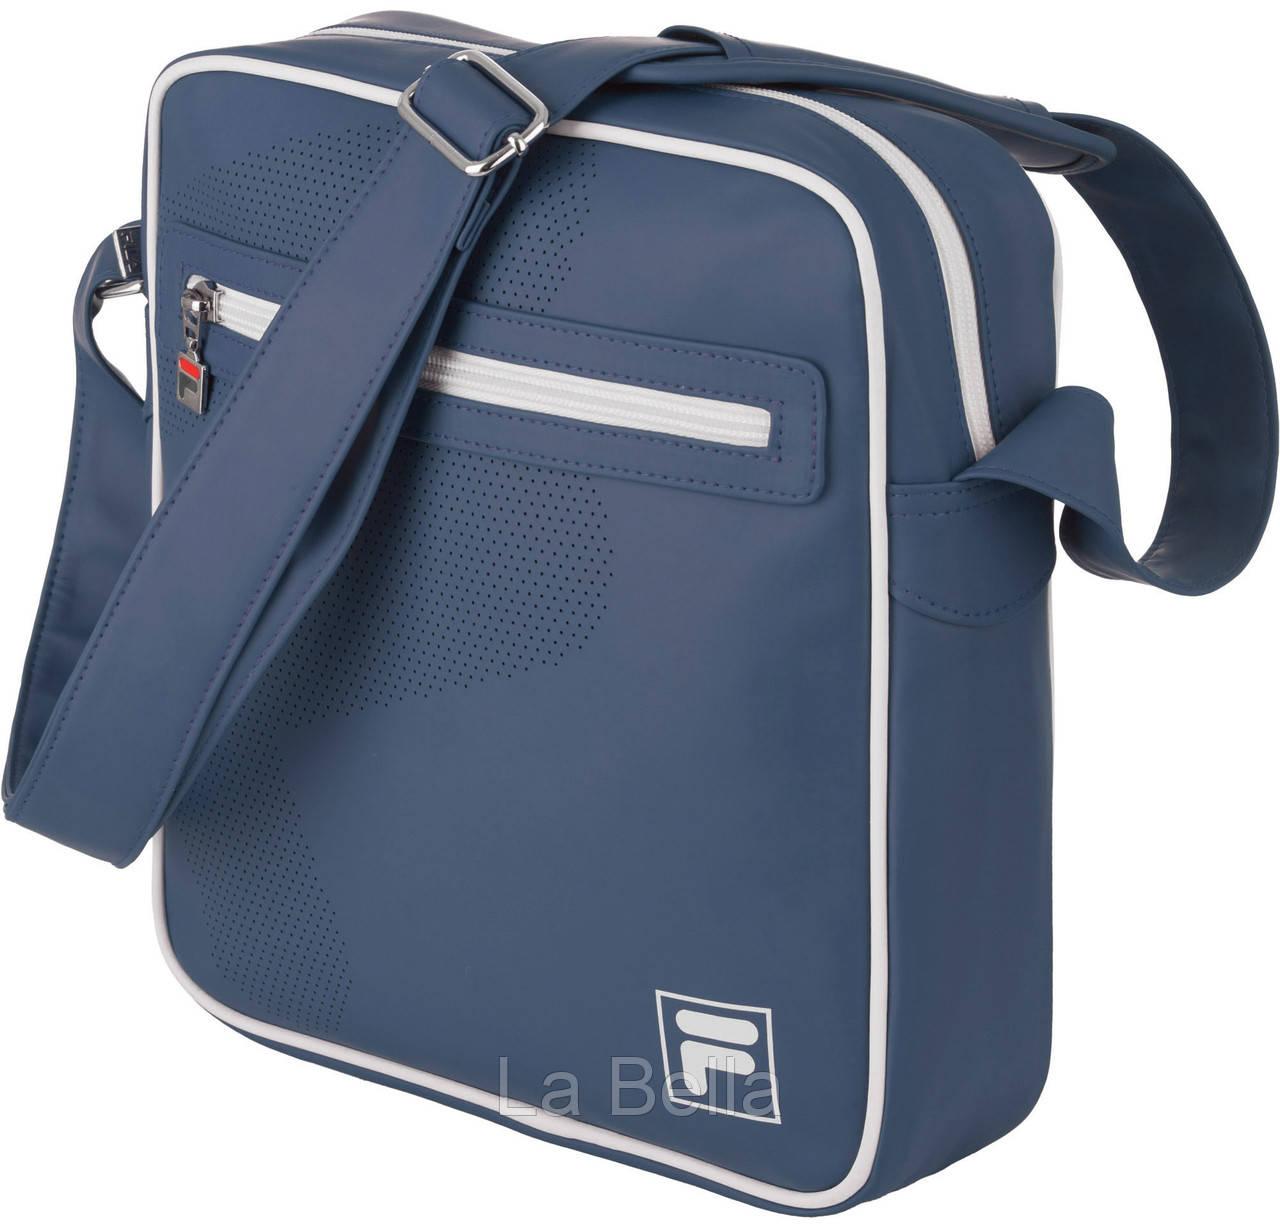 Fila чемоданы цена летские чемоданы